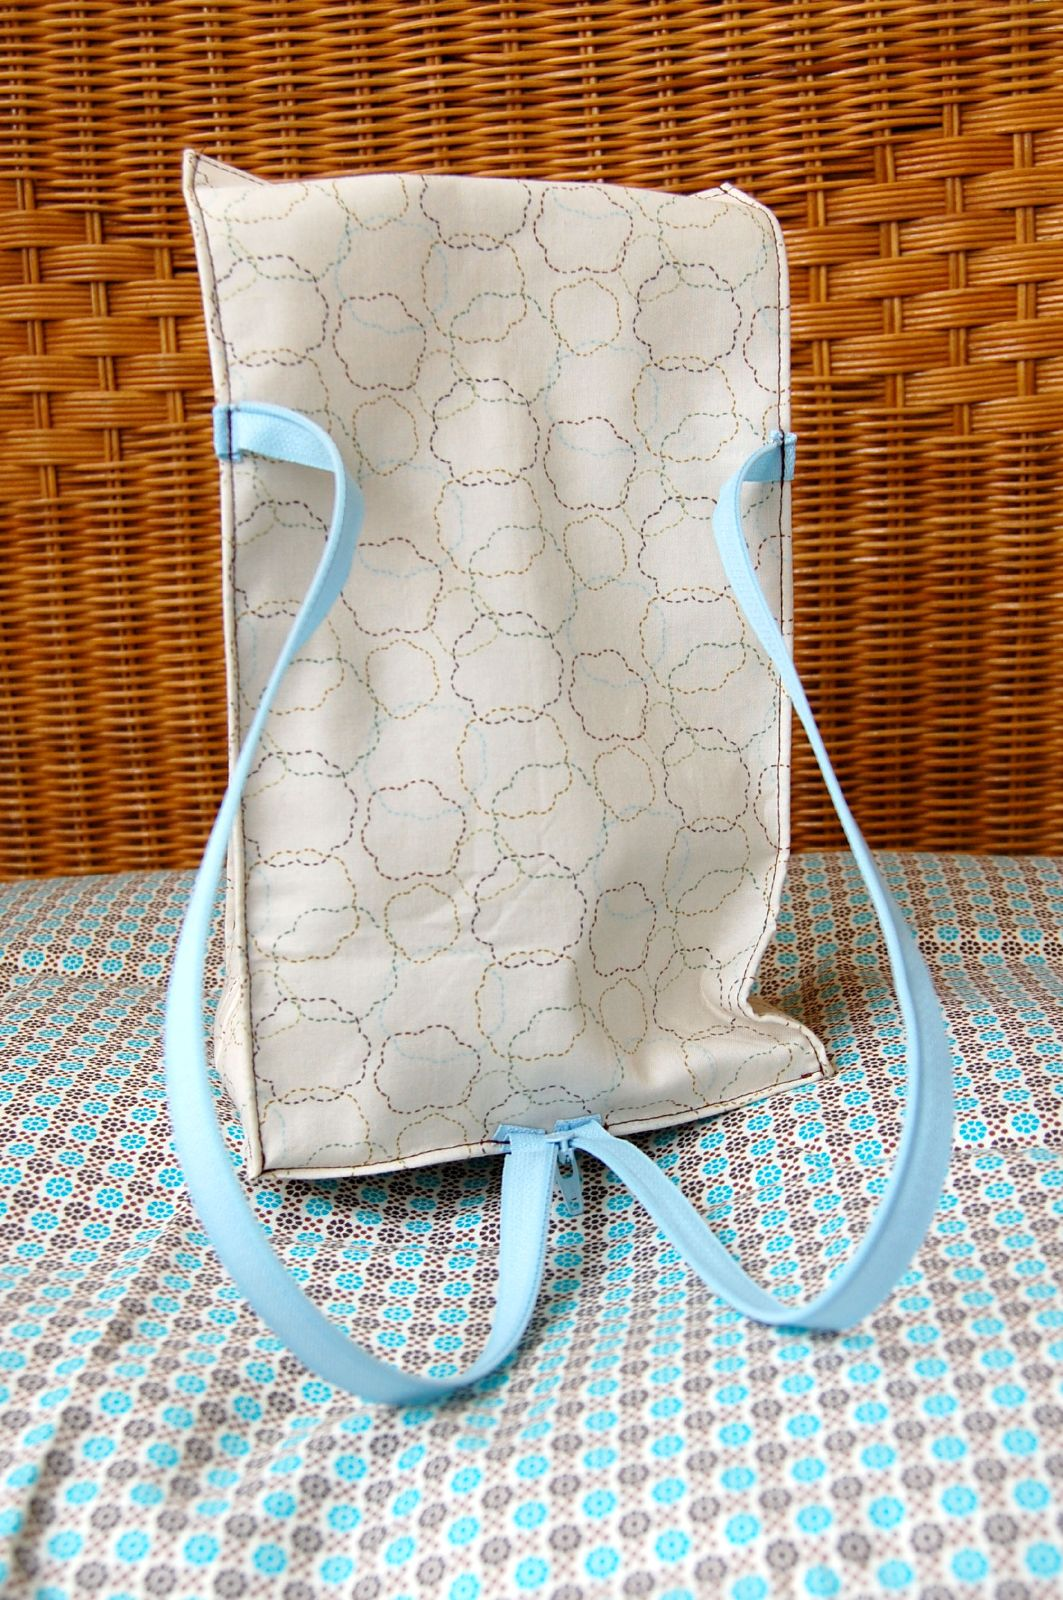 Zipper Strap Lunch Bag Tutorial